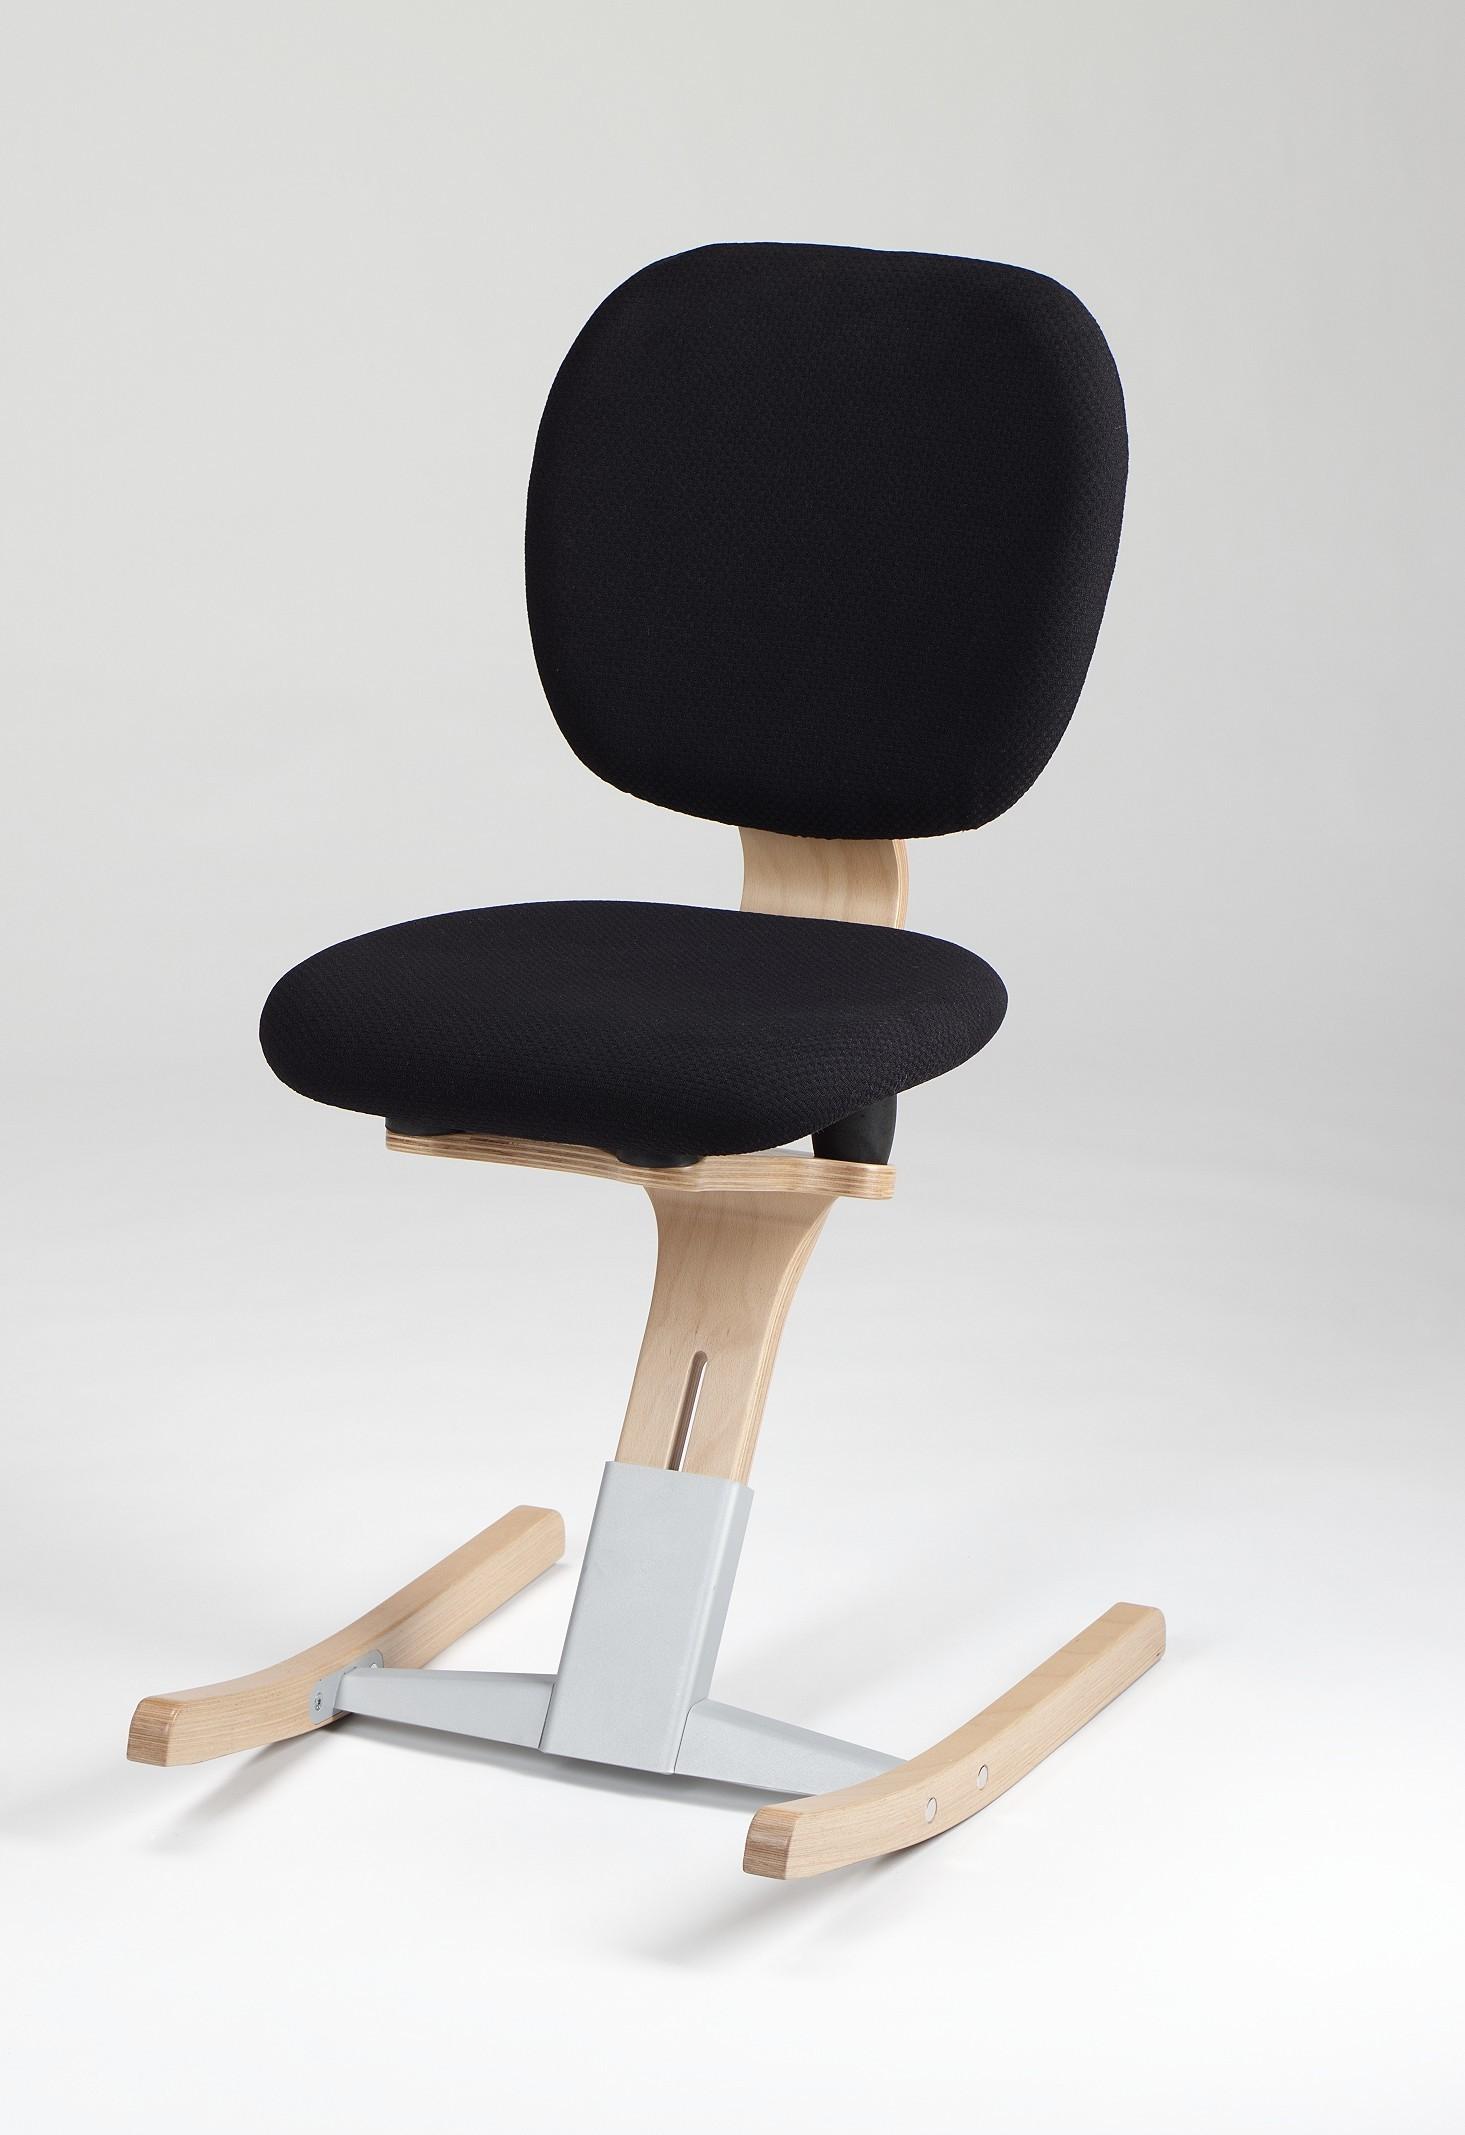 Chaise de bureau que choisir - Quel rehausseur de chaise choisir ...